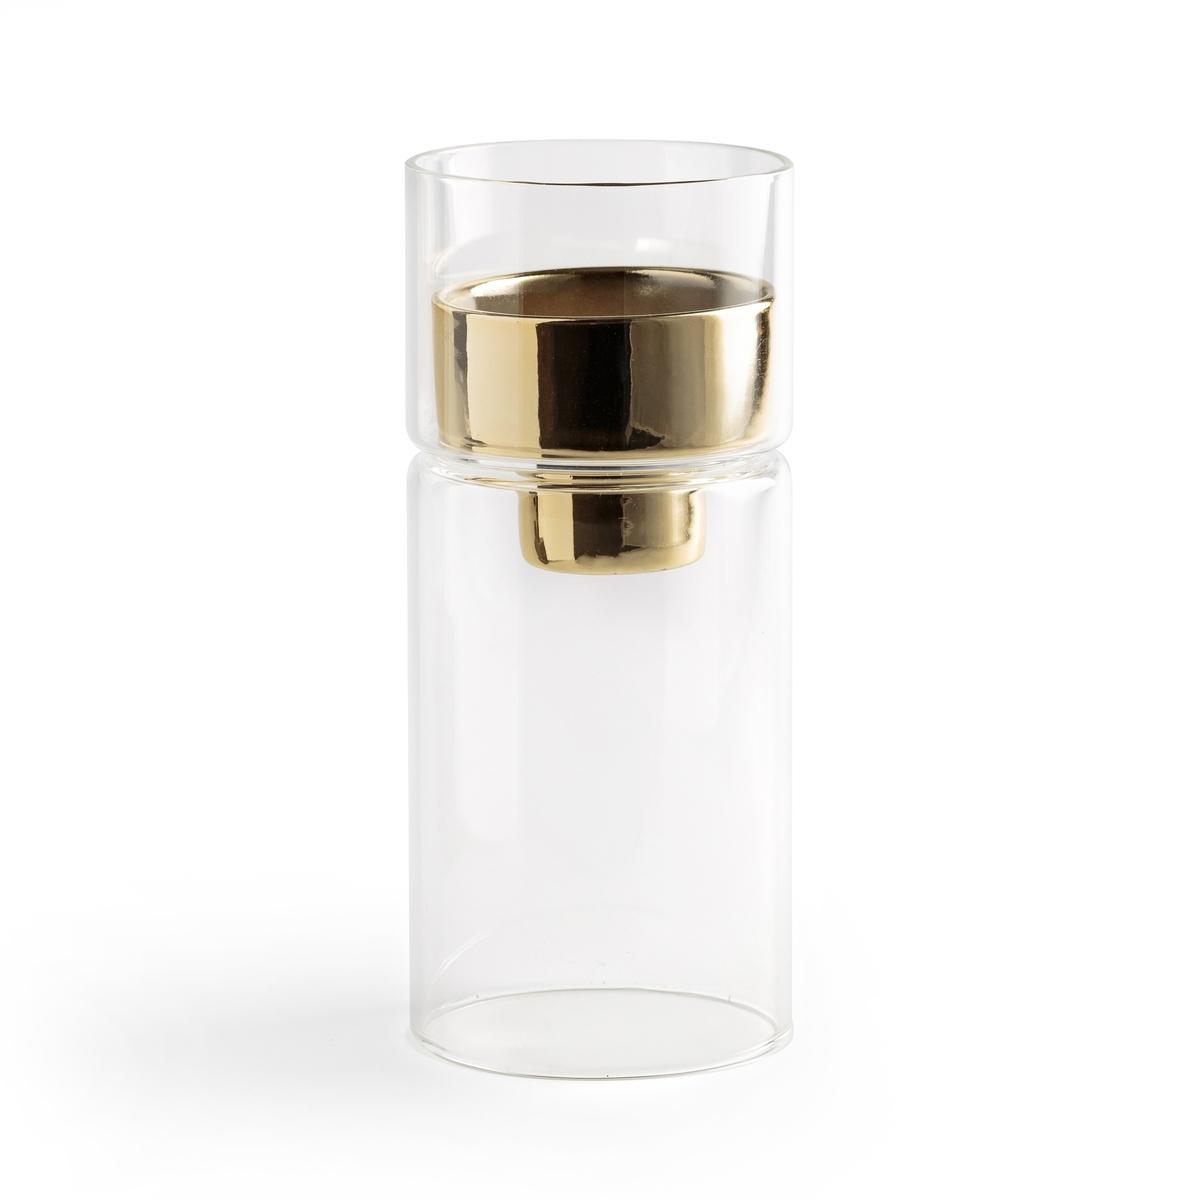 Подсвечник из стекла и латуни FESAME подсвечник из стекла и металла estello